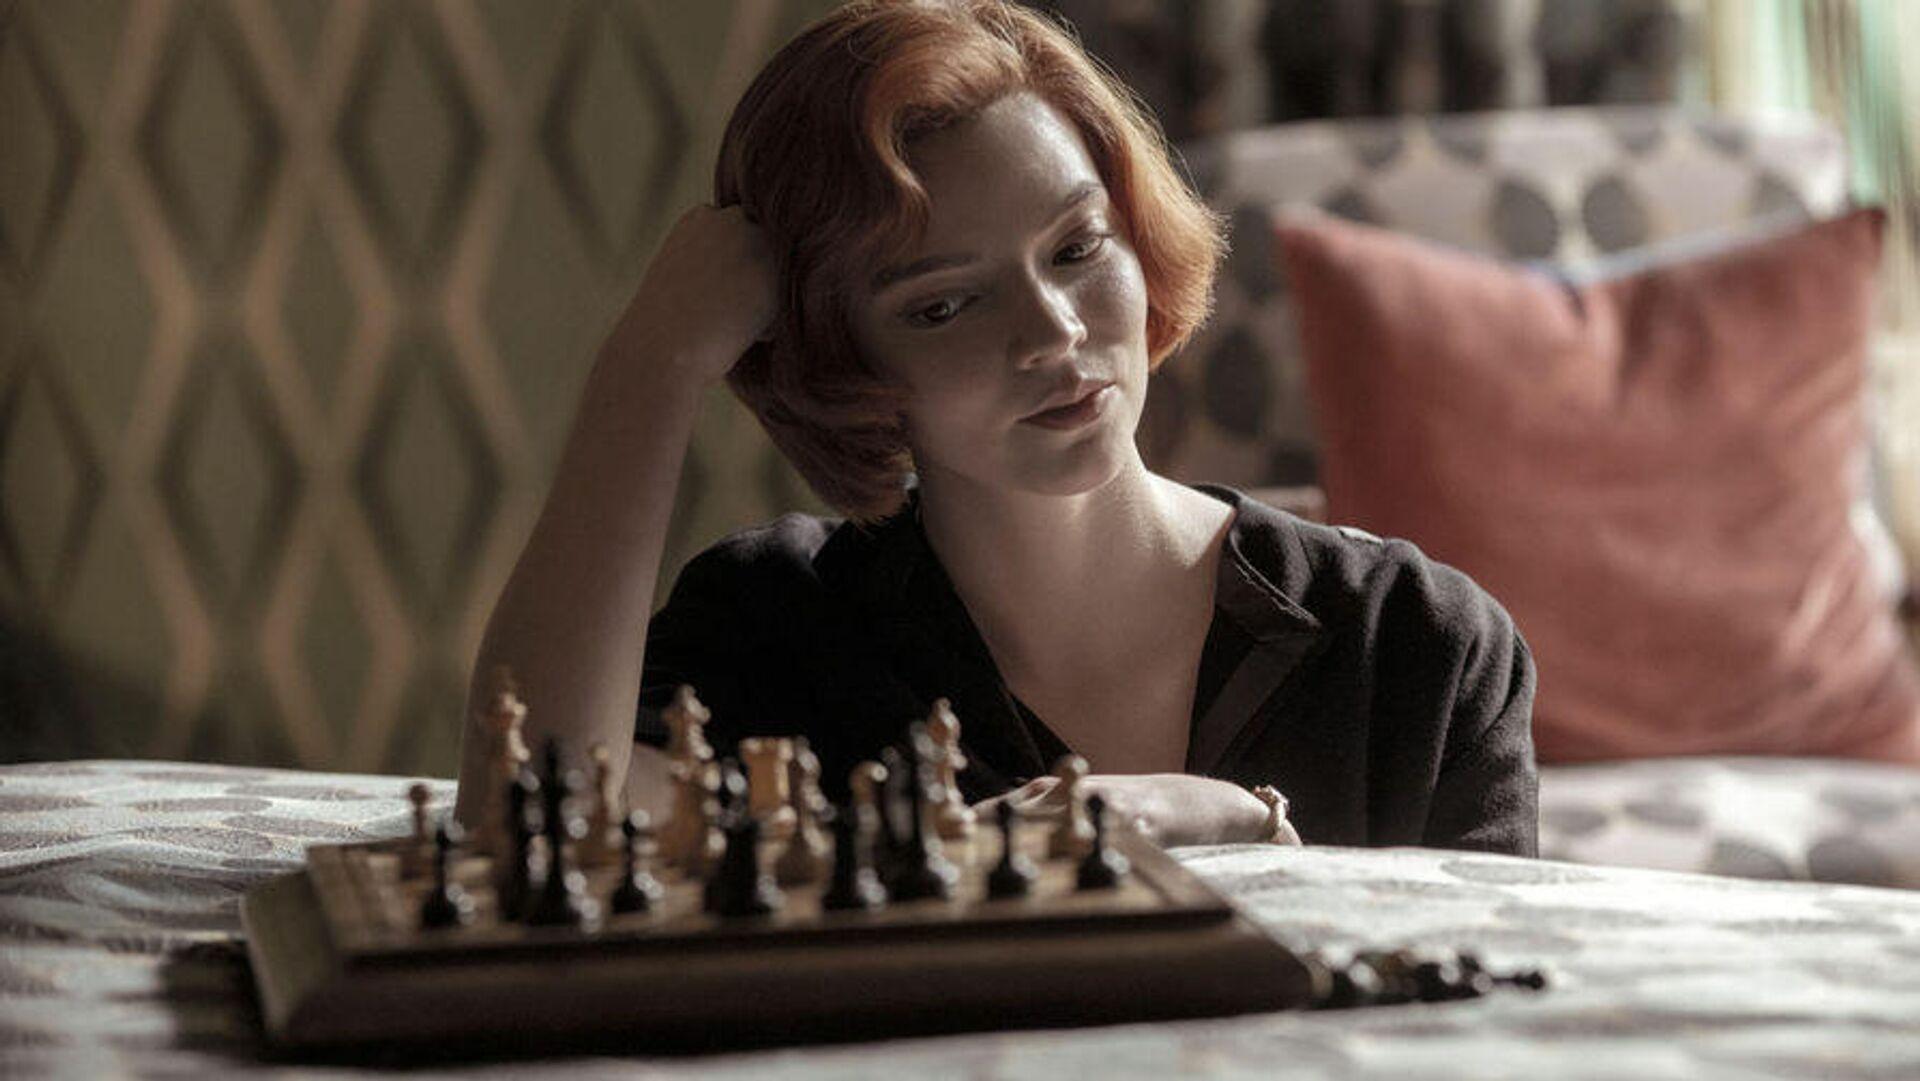 "1584252936 0:0:895:504 1920x0 80 0 0 e1758bd3f90cedd18be746ff88b1d102 - Советская шахматистка подала в суд на создателей ""Хода королевы"""